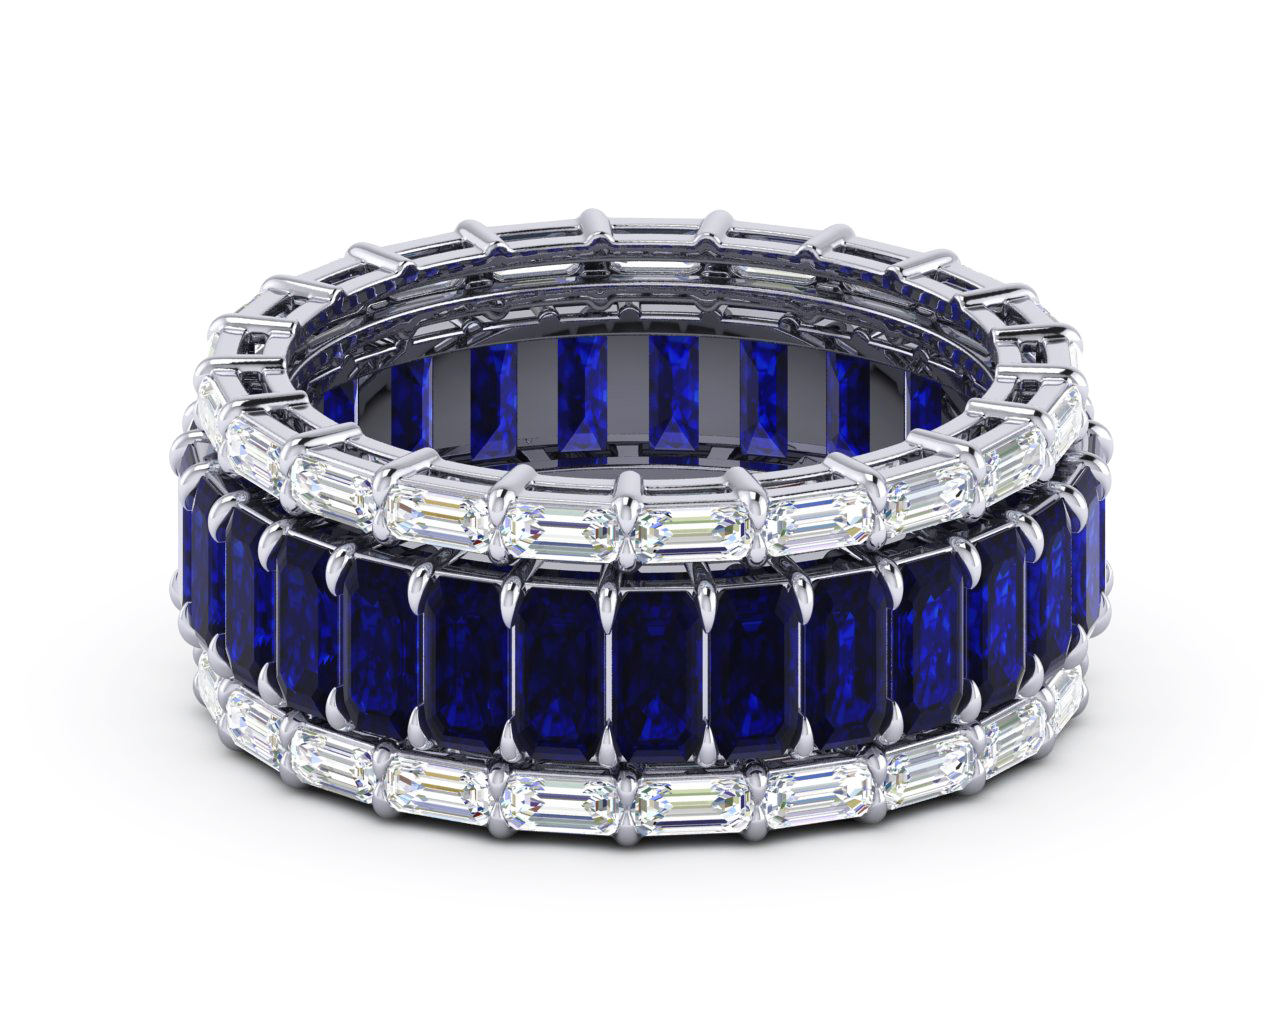 1527 RHODIUM BAND SAPPHIRE BLUE SIMULATED DIAMOND FULL ETERNITY BAND EMERALD CUT